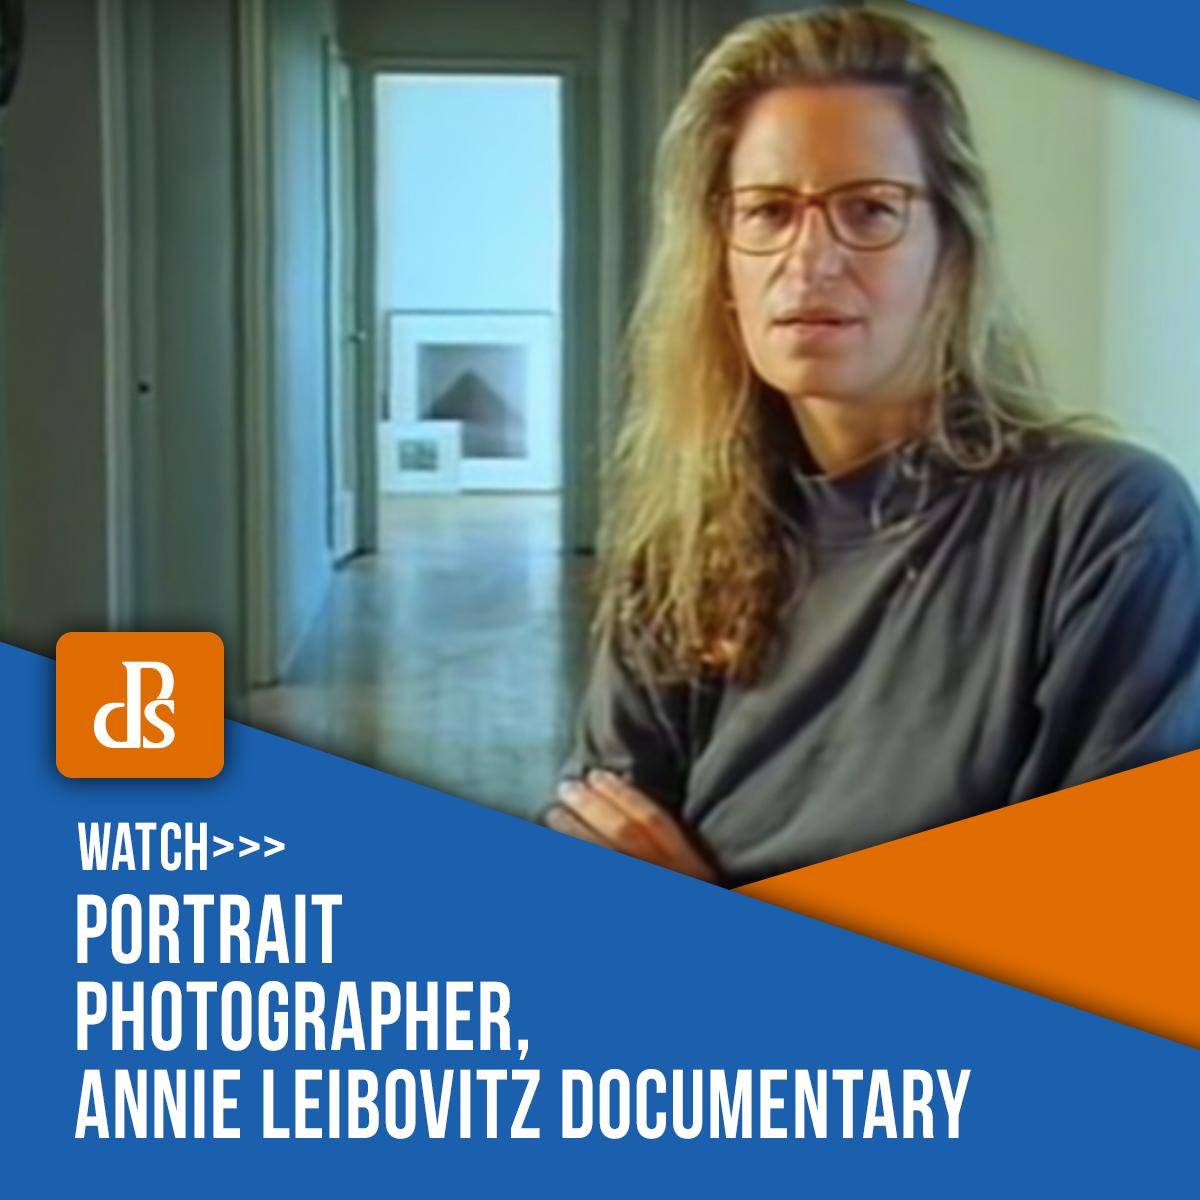 annie-leibovitz-documentary-1993